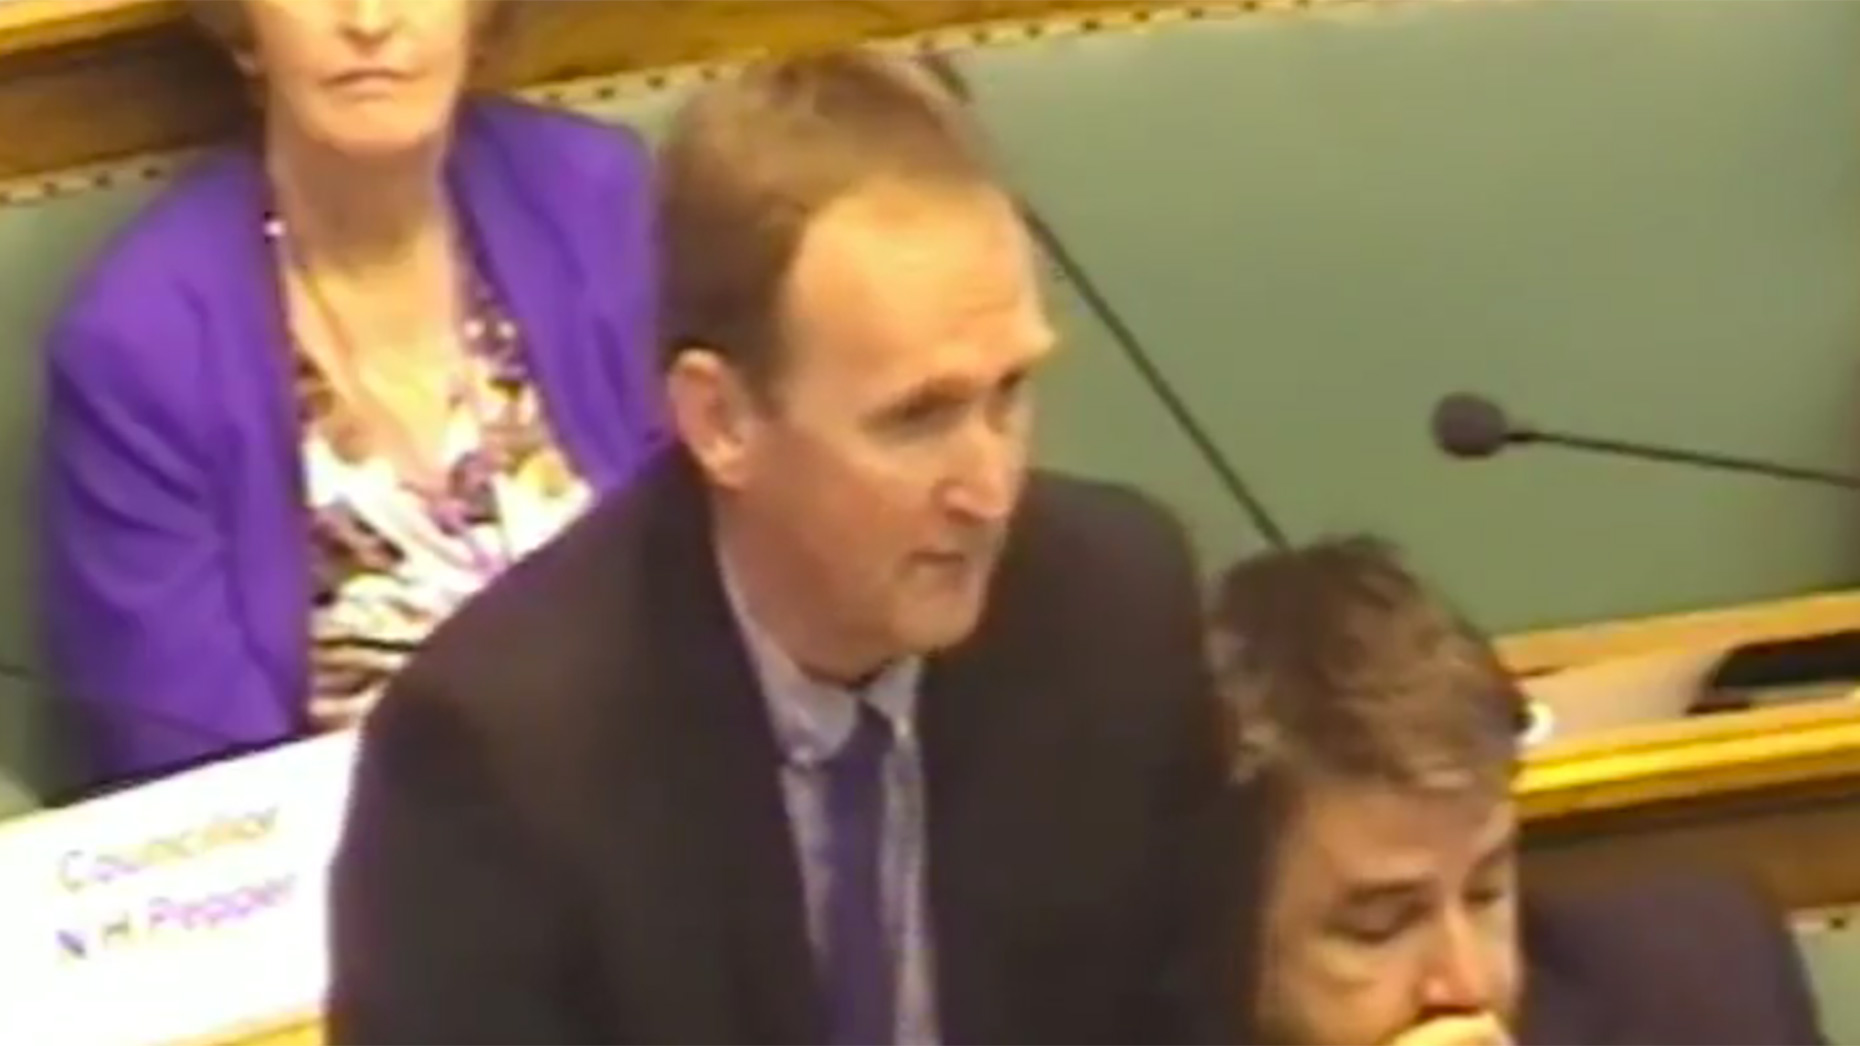 Councillor Nick Worth